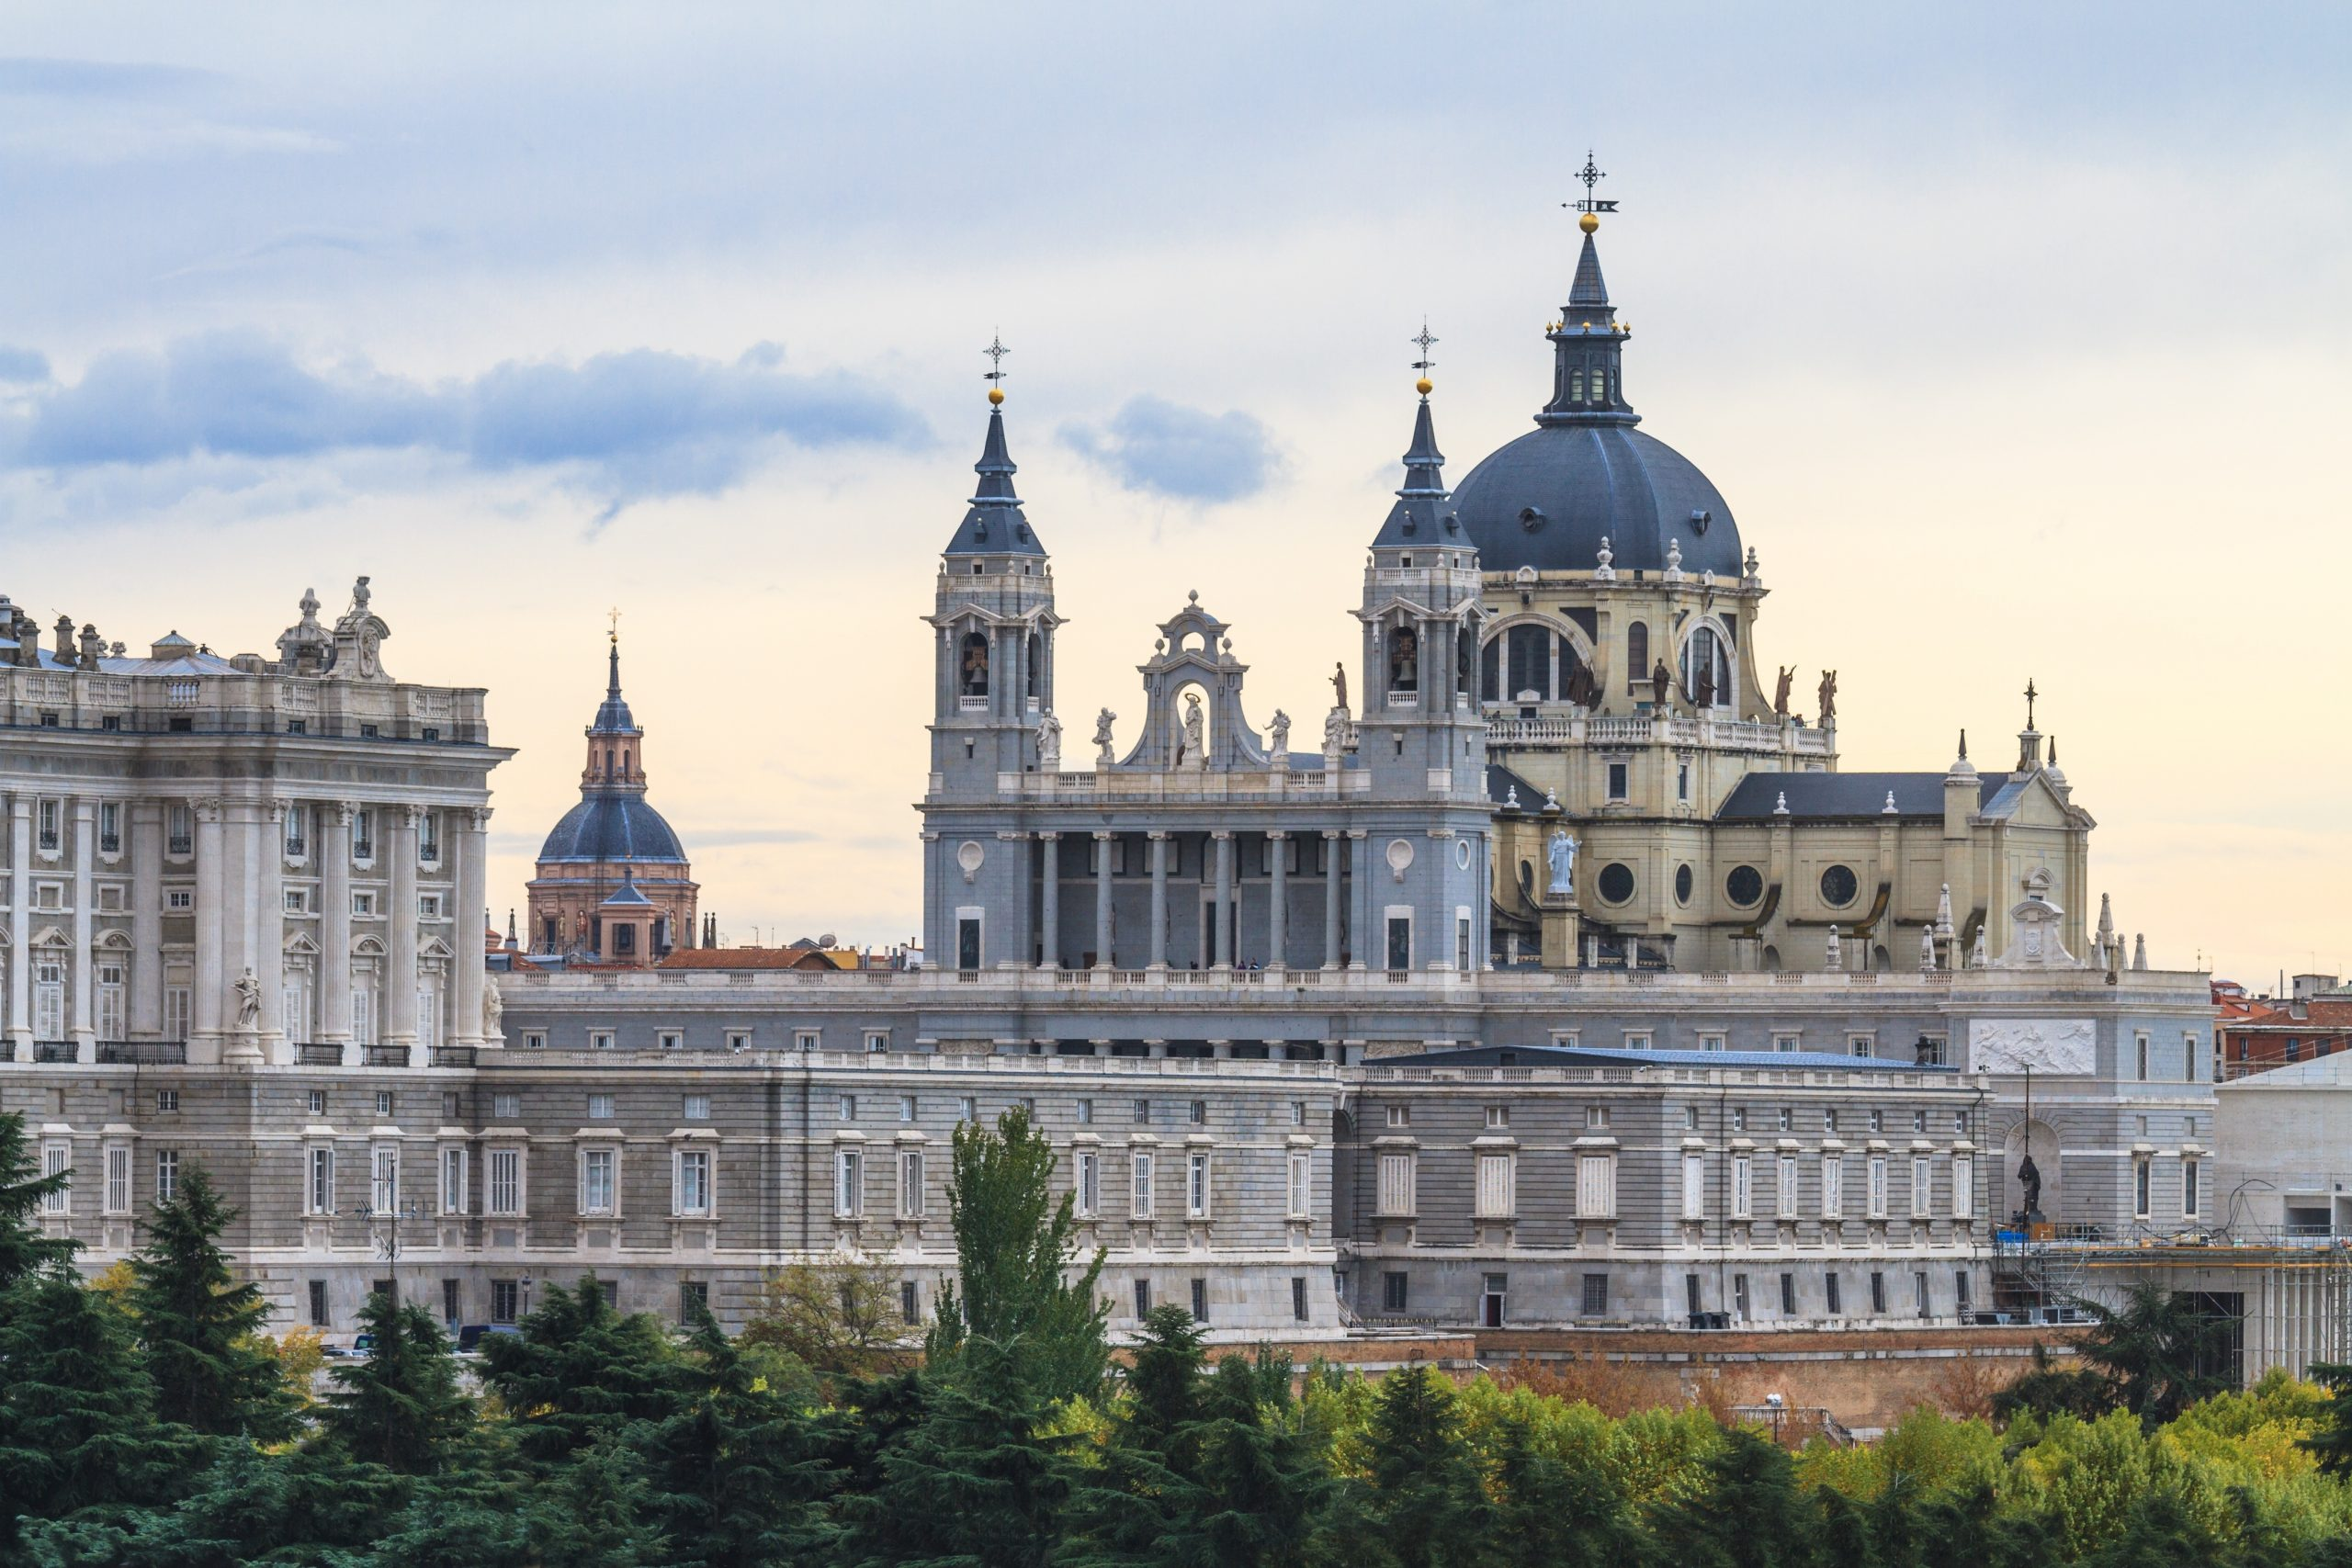 17191568 Almudena Cathedral, Madrid, Spain